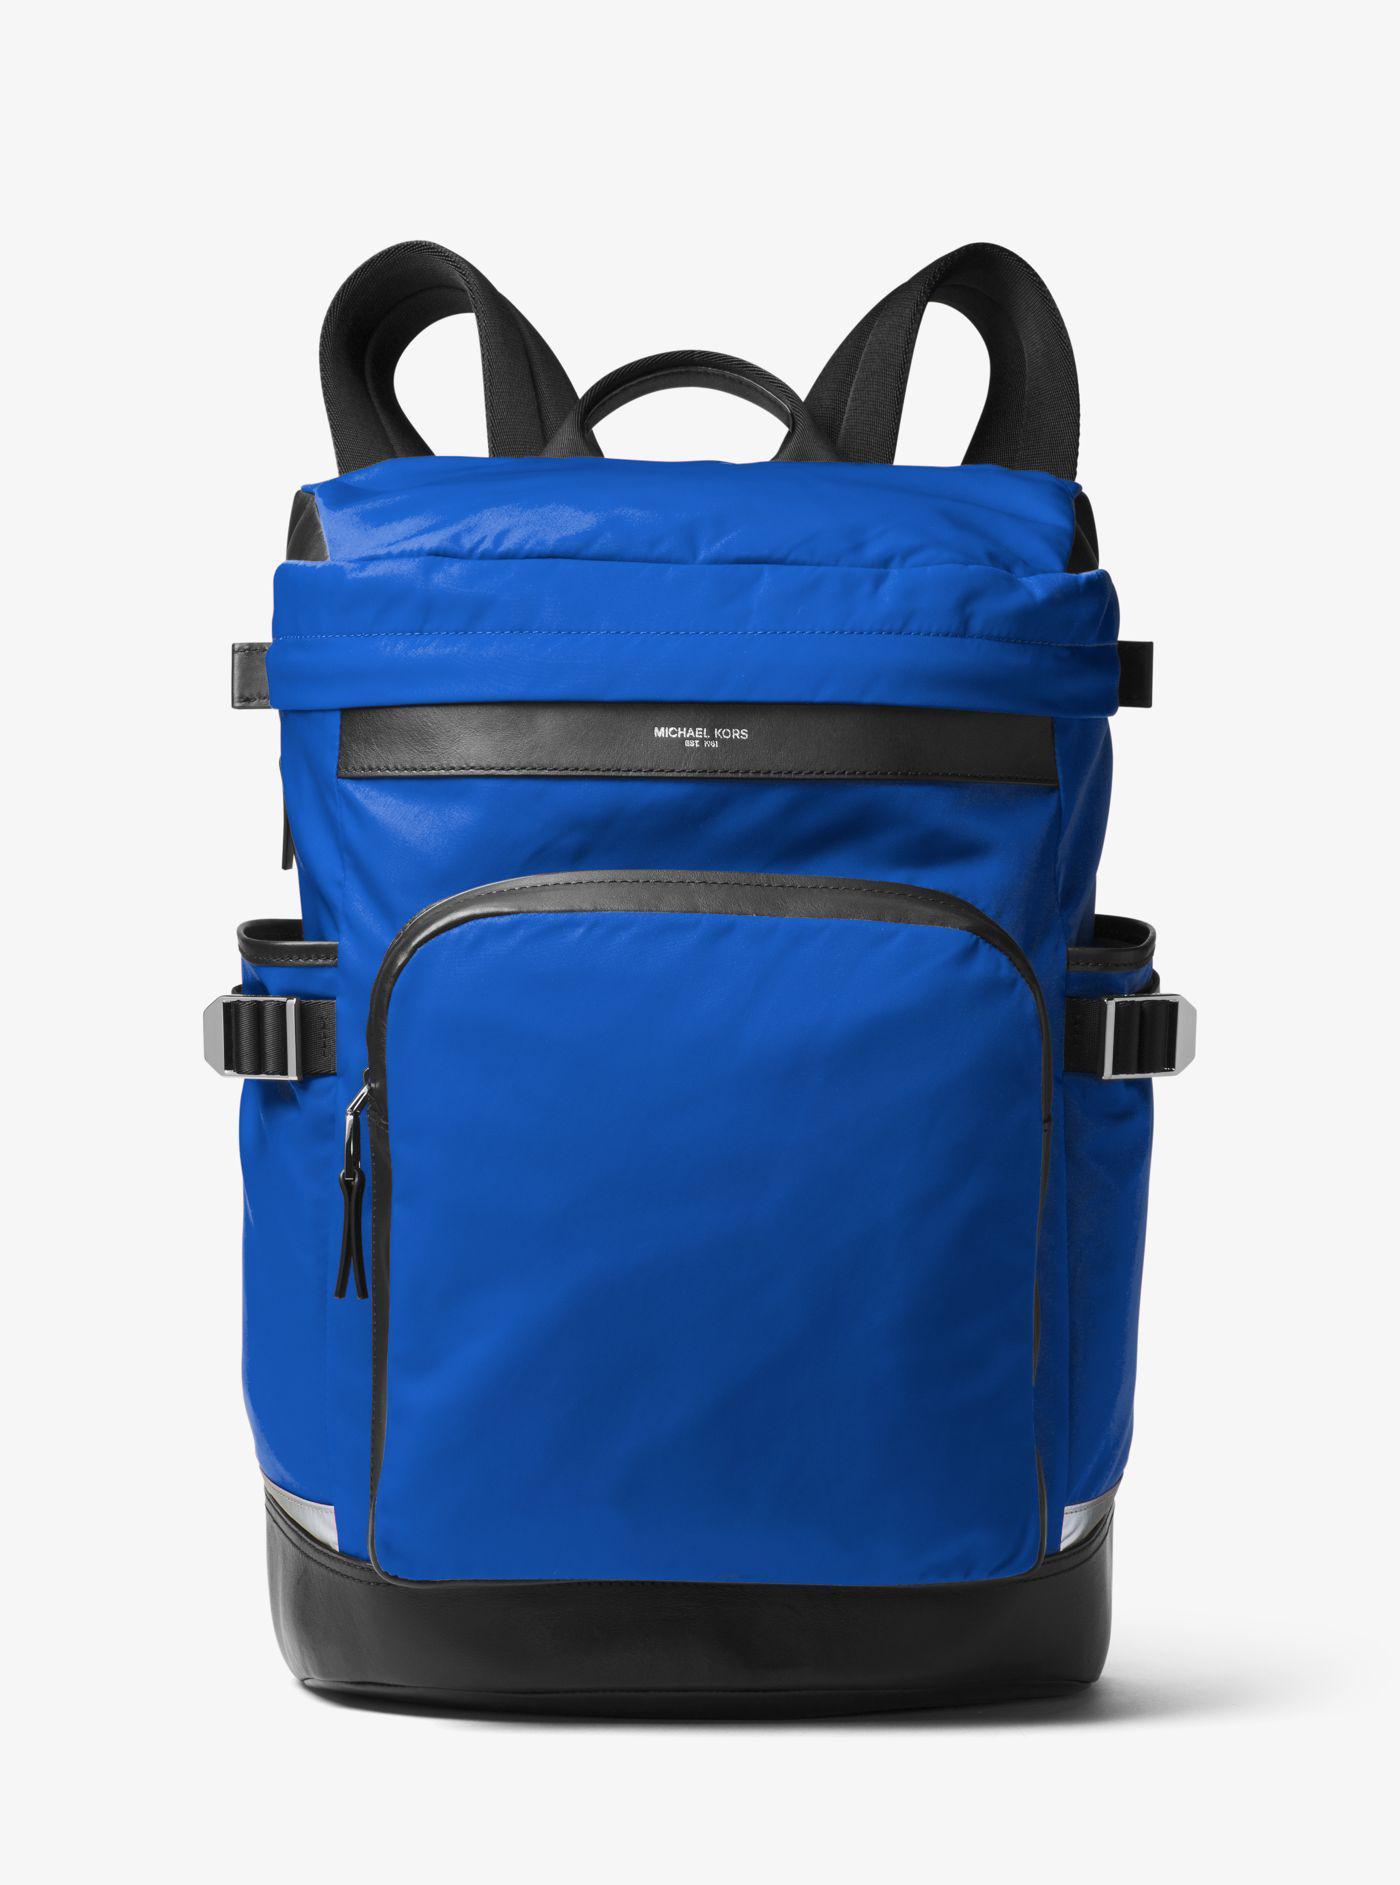 d8811cc72de9 Lyst - Michael Kors Kent Nylon Cycling Backpack in Blue for Men